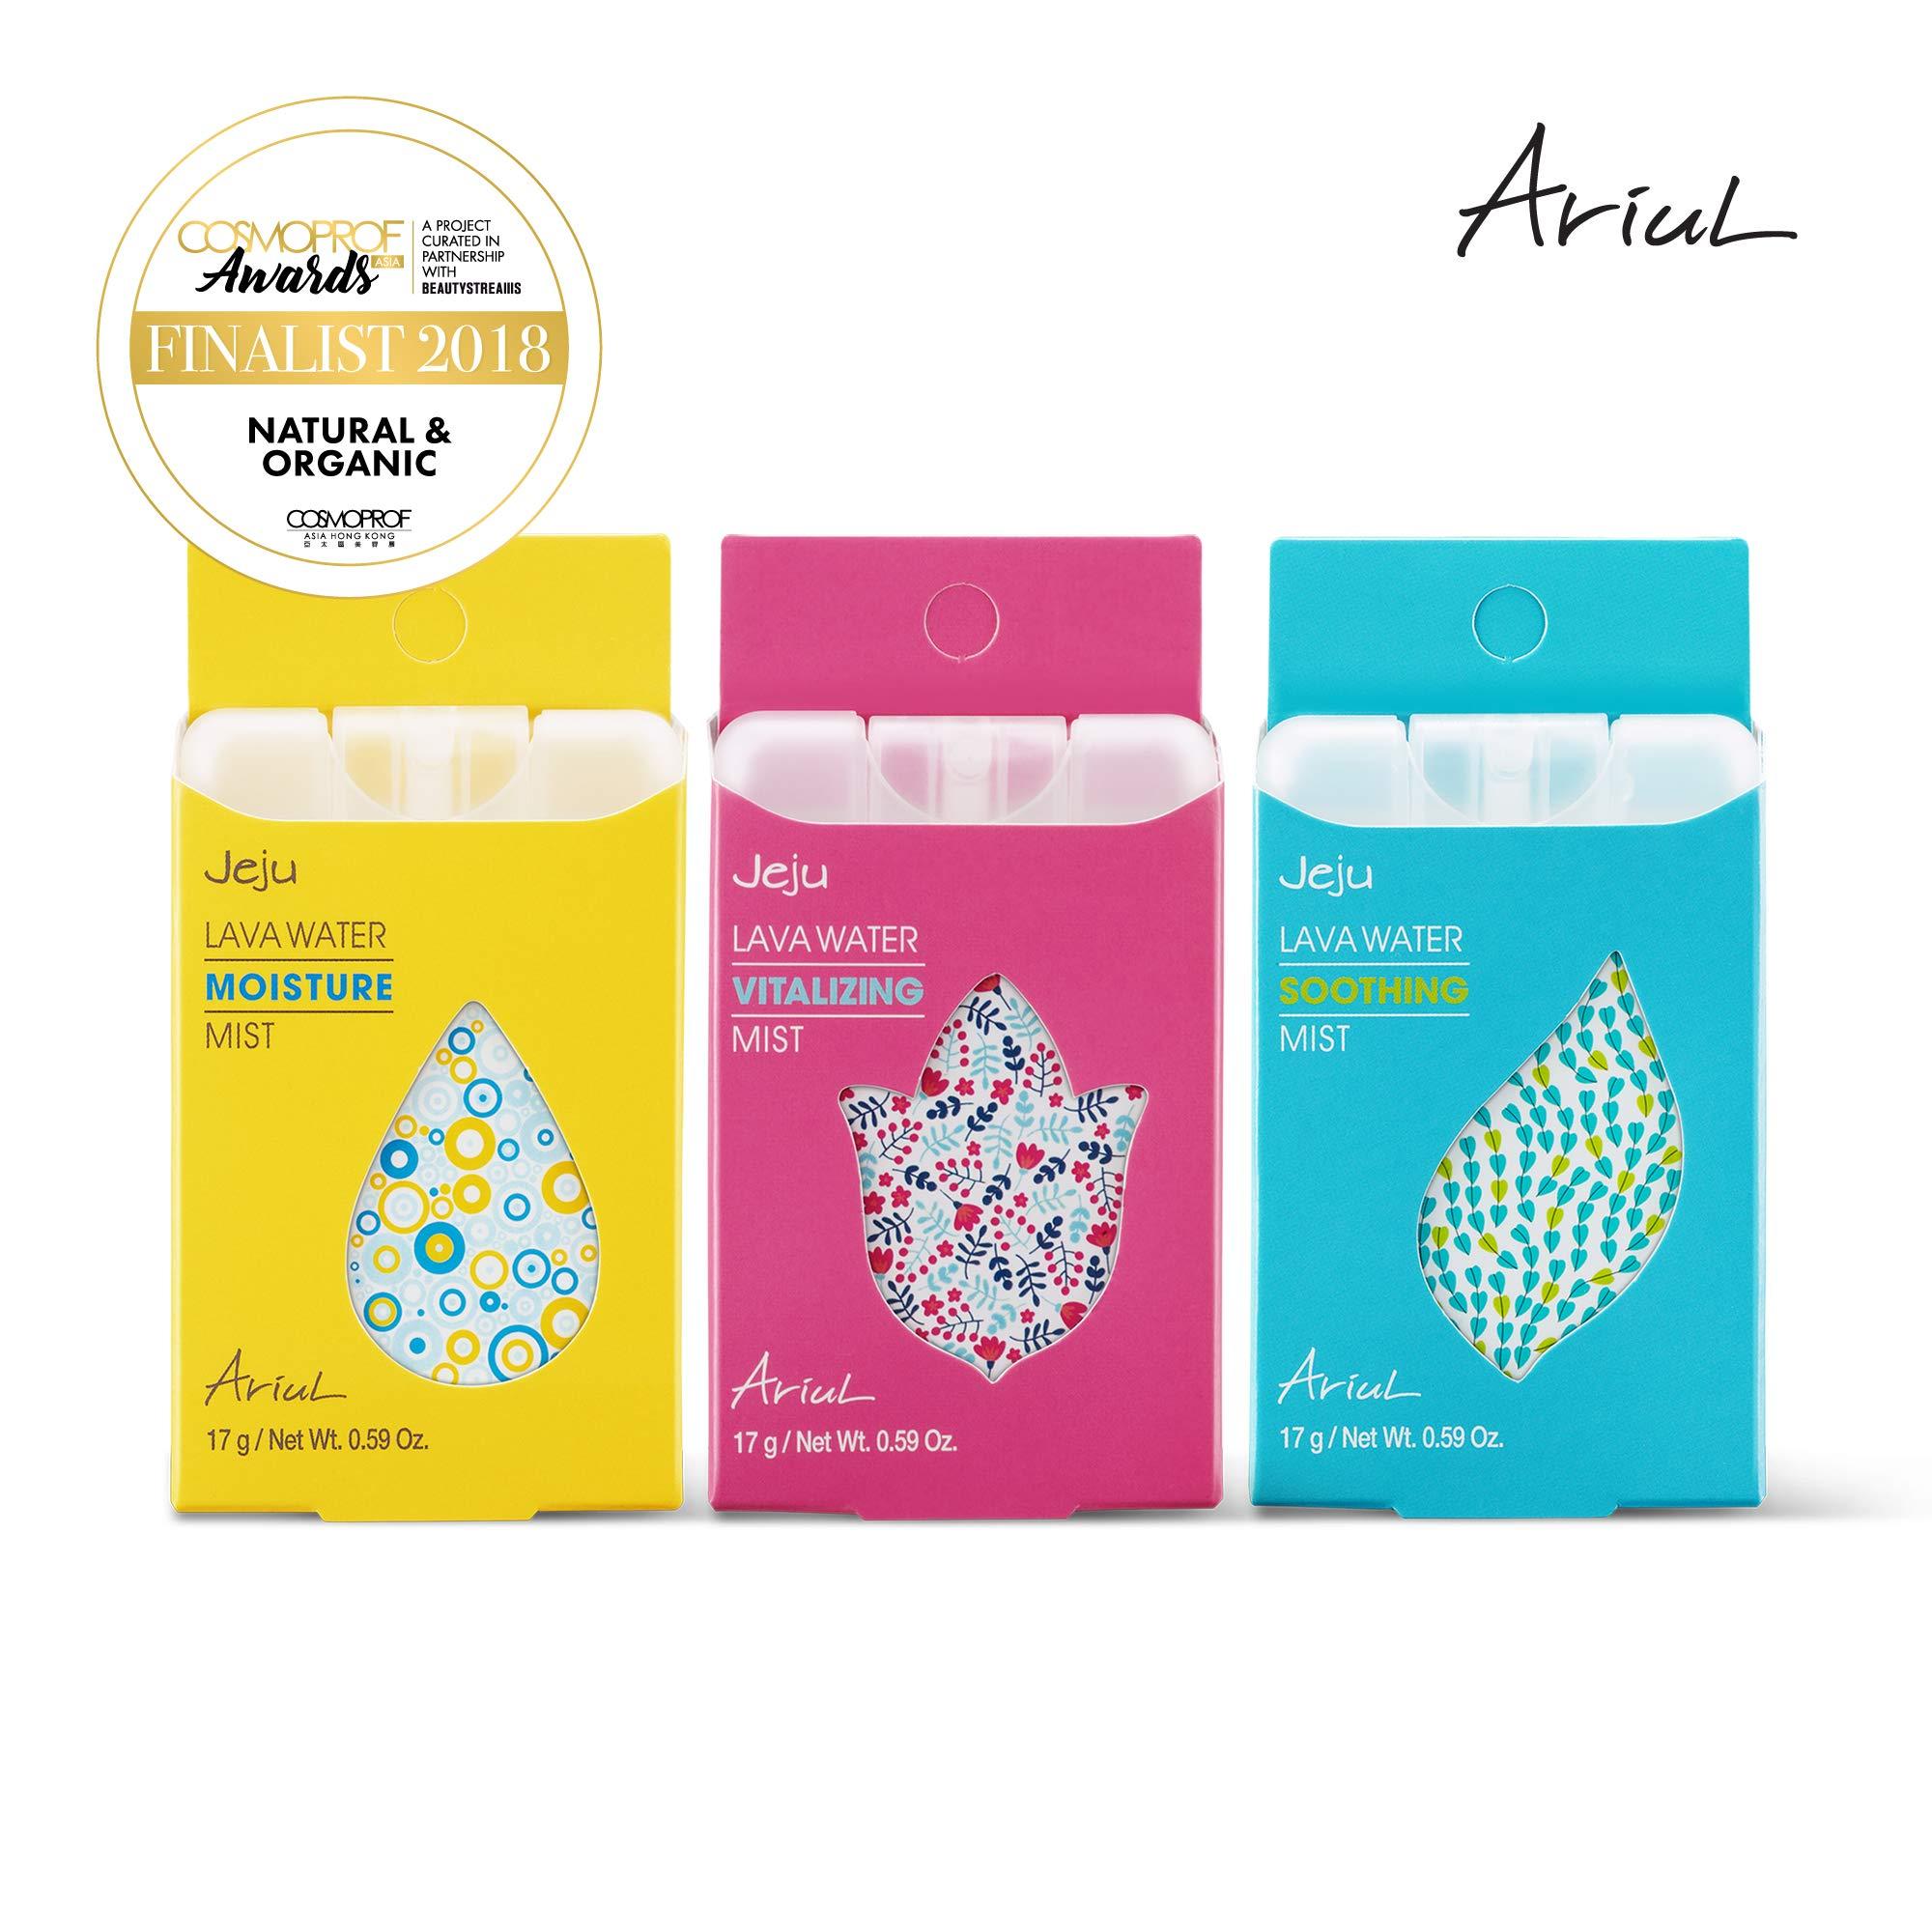 Ariul Jeju Lava Water Mist Bundle (1 Moisture, 1 Vitalizing, 1 Soothing, 0.59 oz each) Unscented 100% EWG Green Graded Nutrients, Pocket Travel Size Face Mist, Toner, Makeup Setting Spray